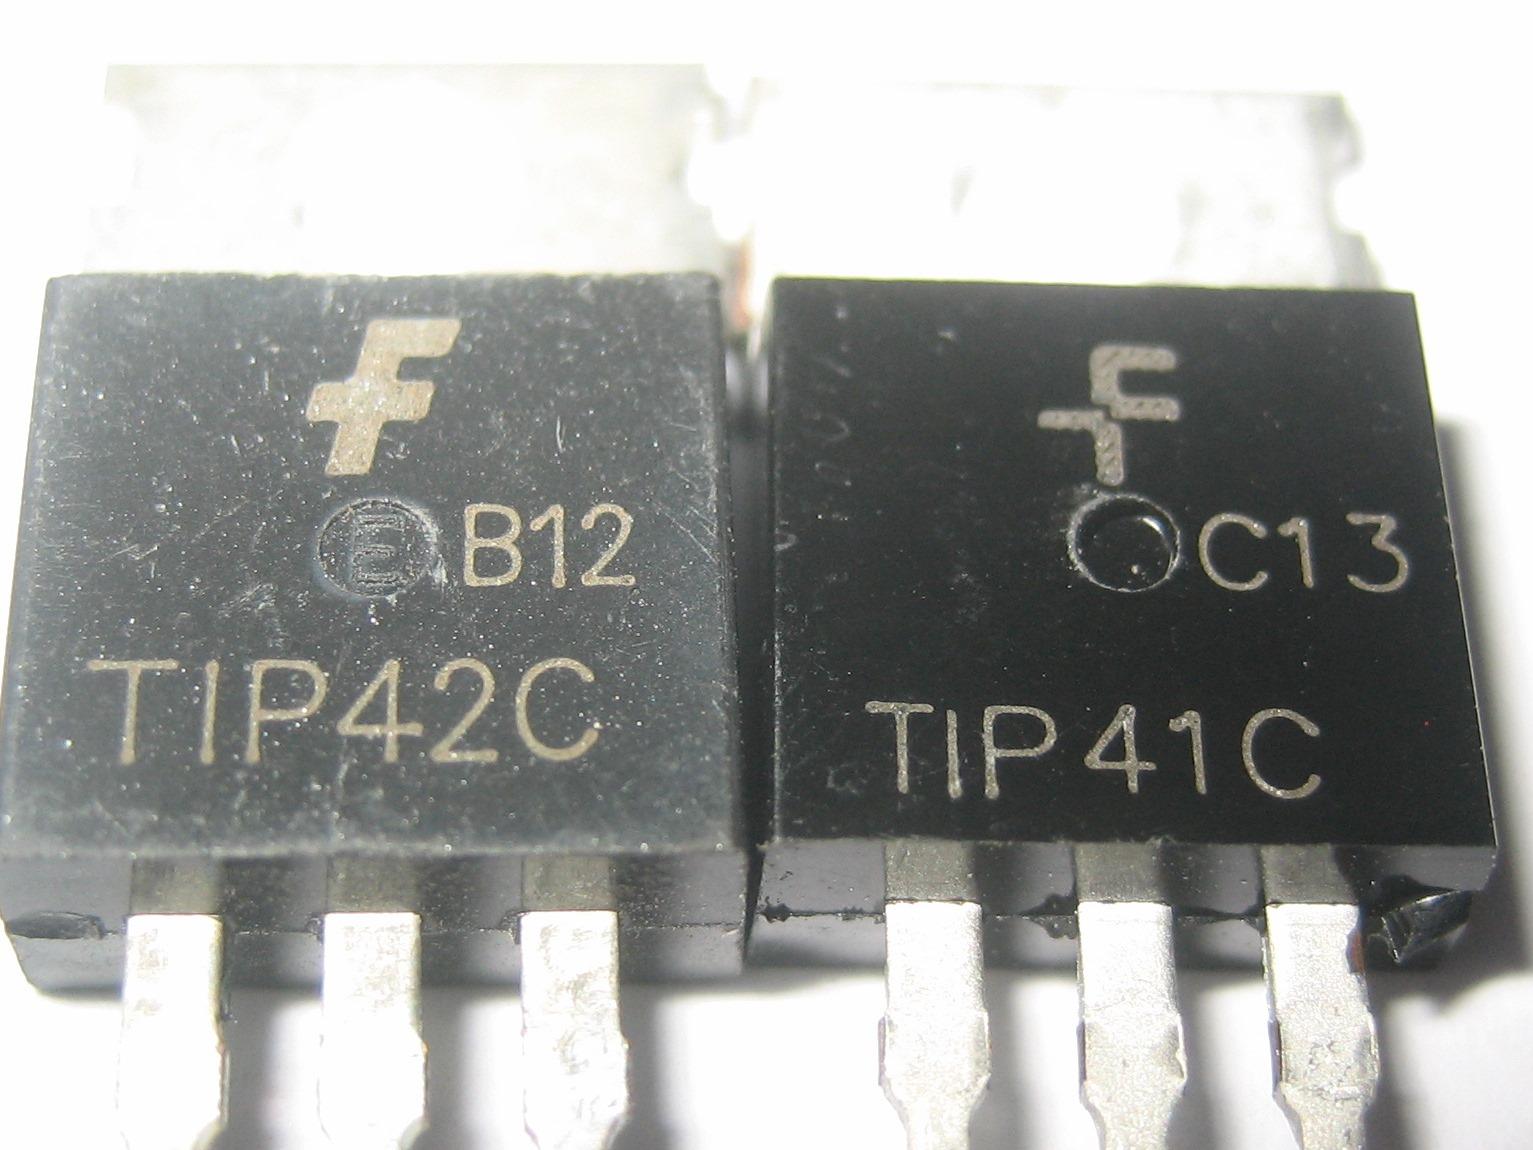 hight resolution of jual transistor tip41c tip42c tip41 tip42 fairchild 1 pasang 2 pcs di lapak audio parts audioparts